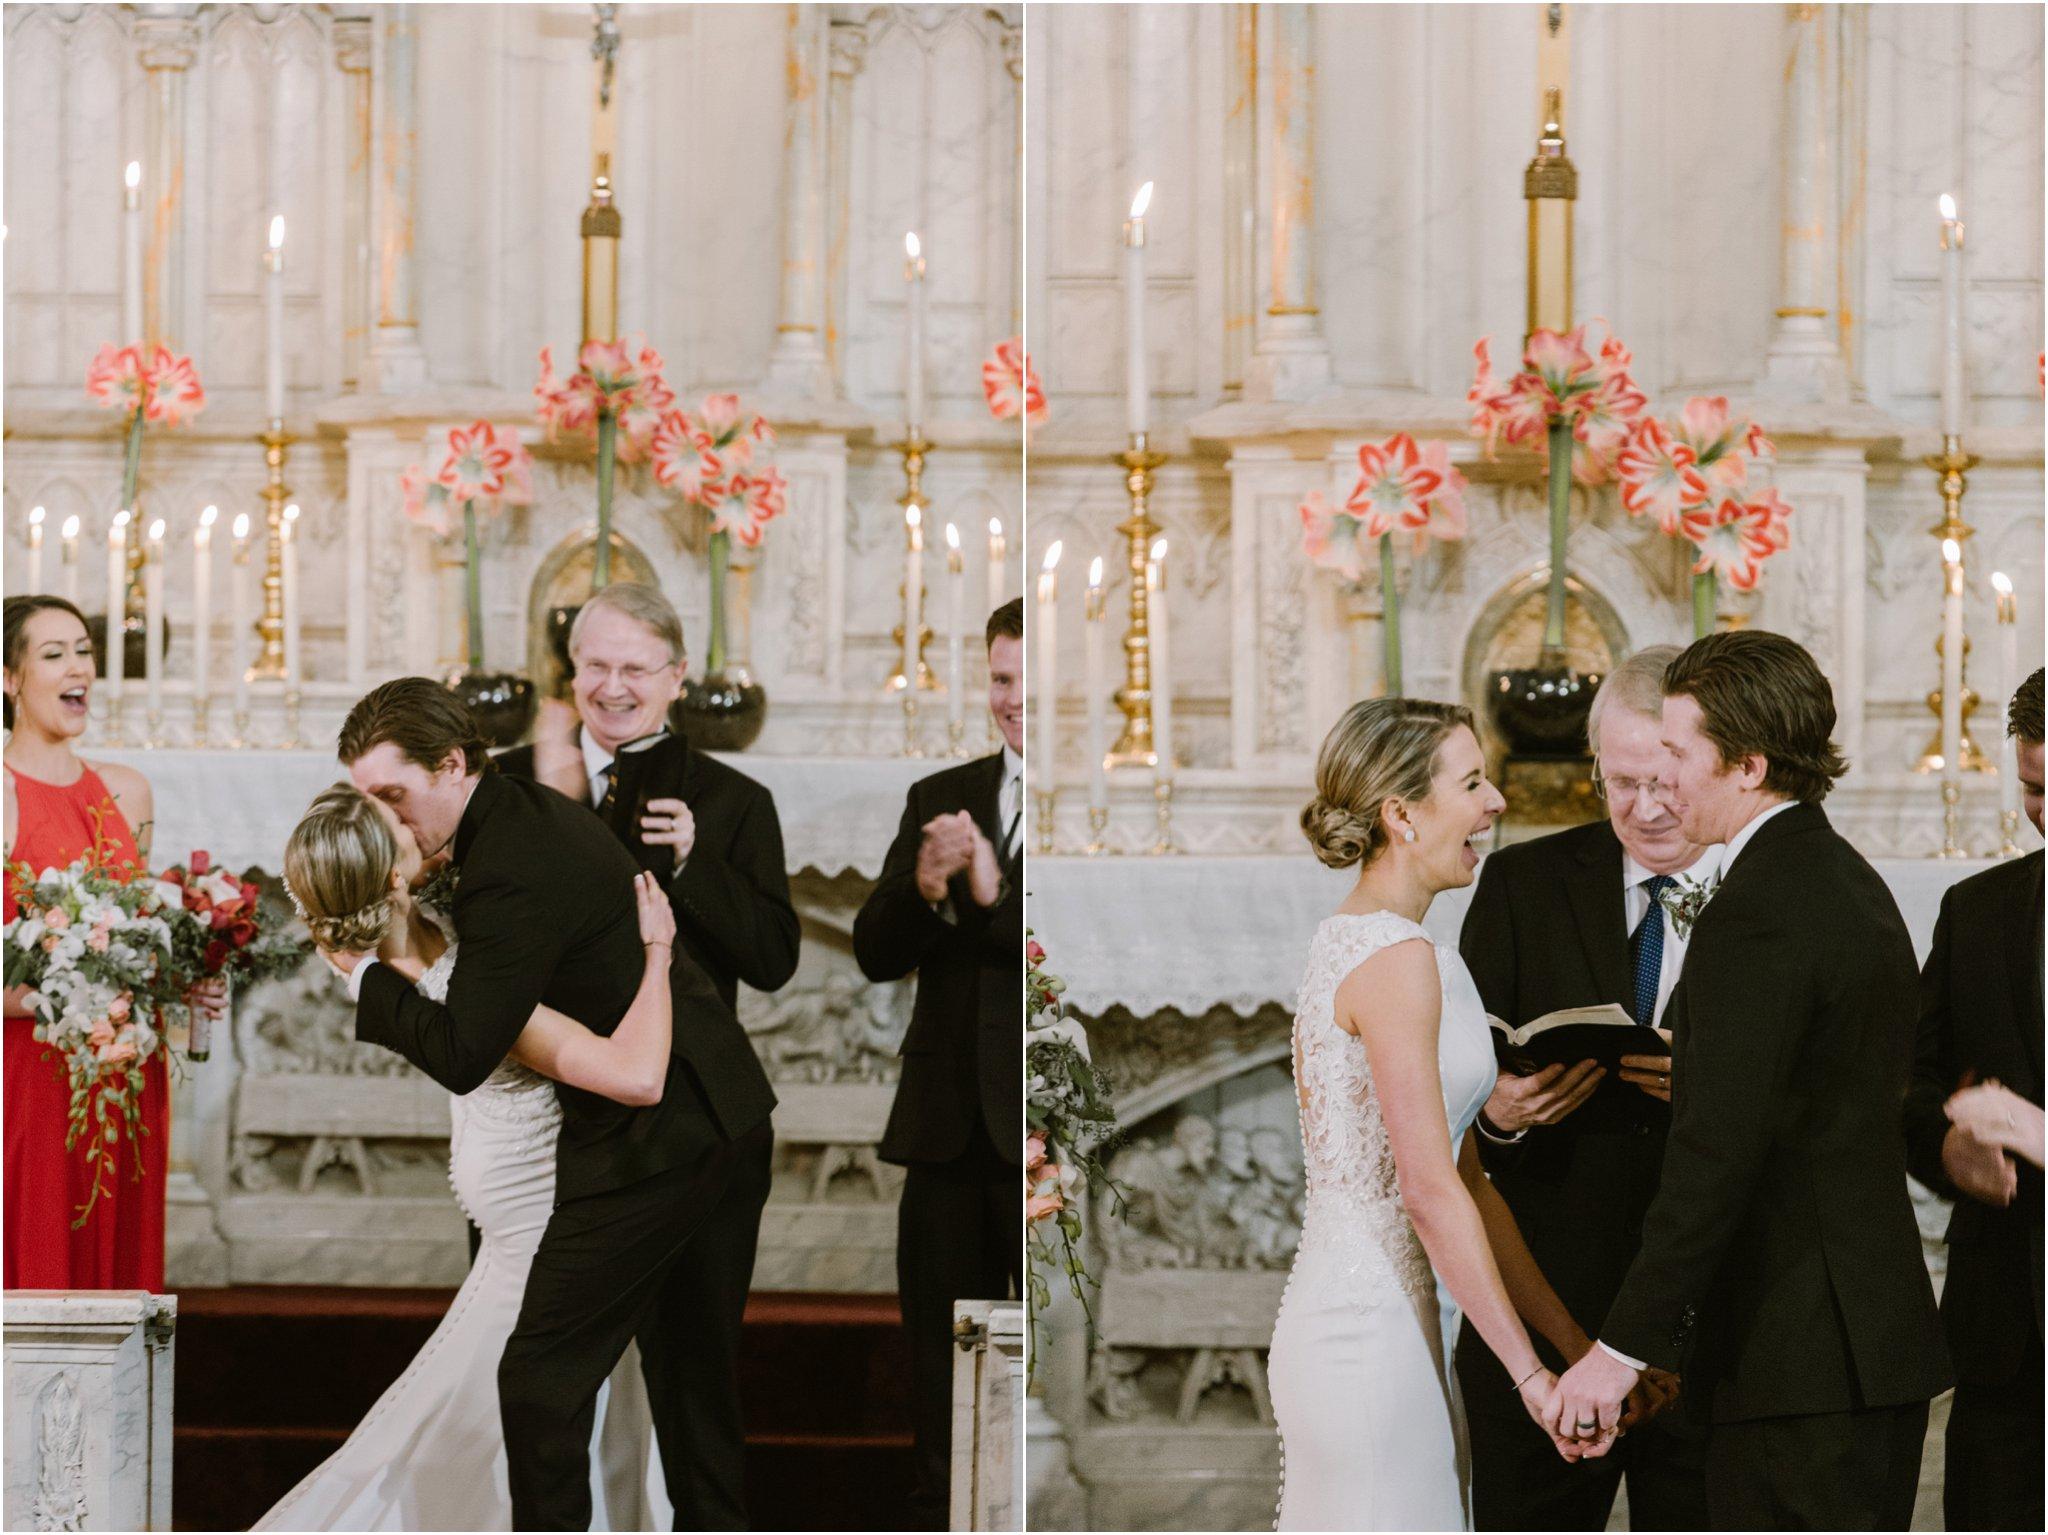 0916Loretto Chapel Wedding, Inn and Spa at Loretto wedding, Santa Fe wedding photographers, blue rose photography